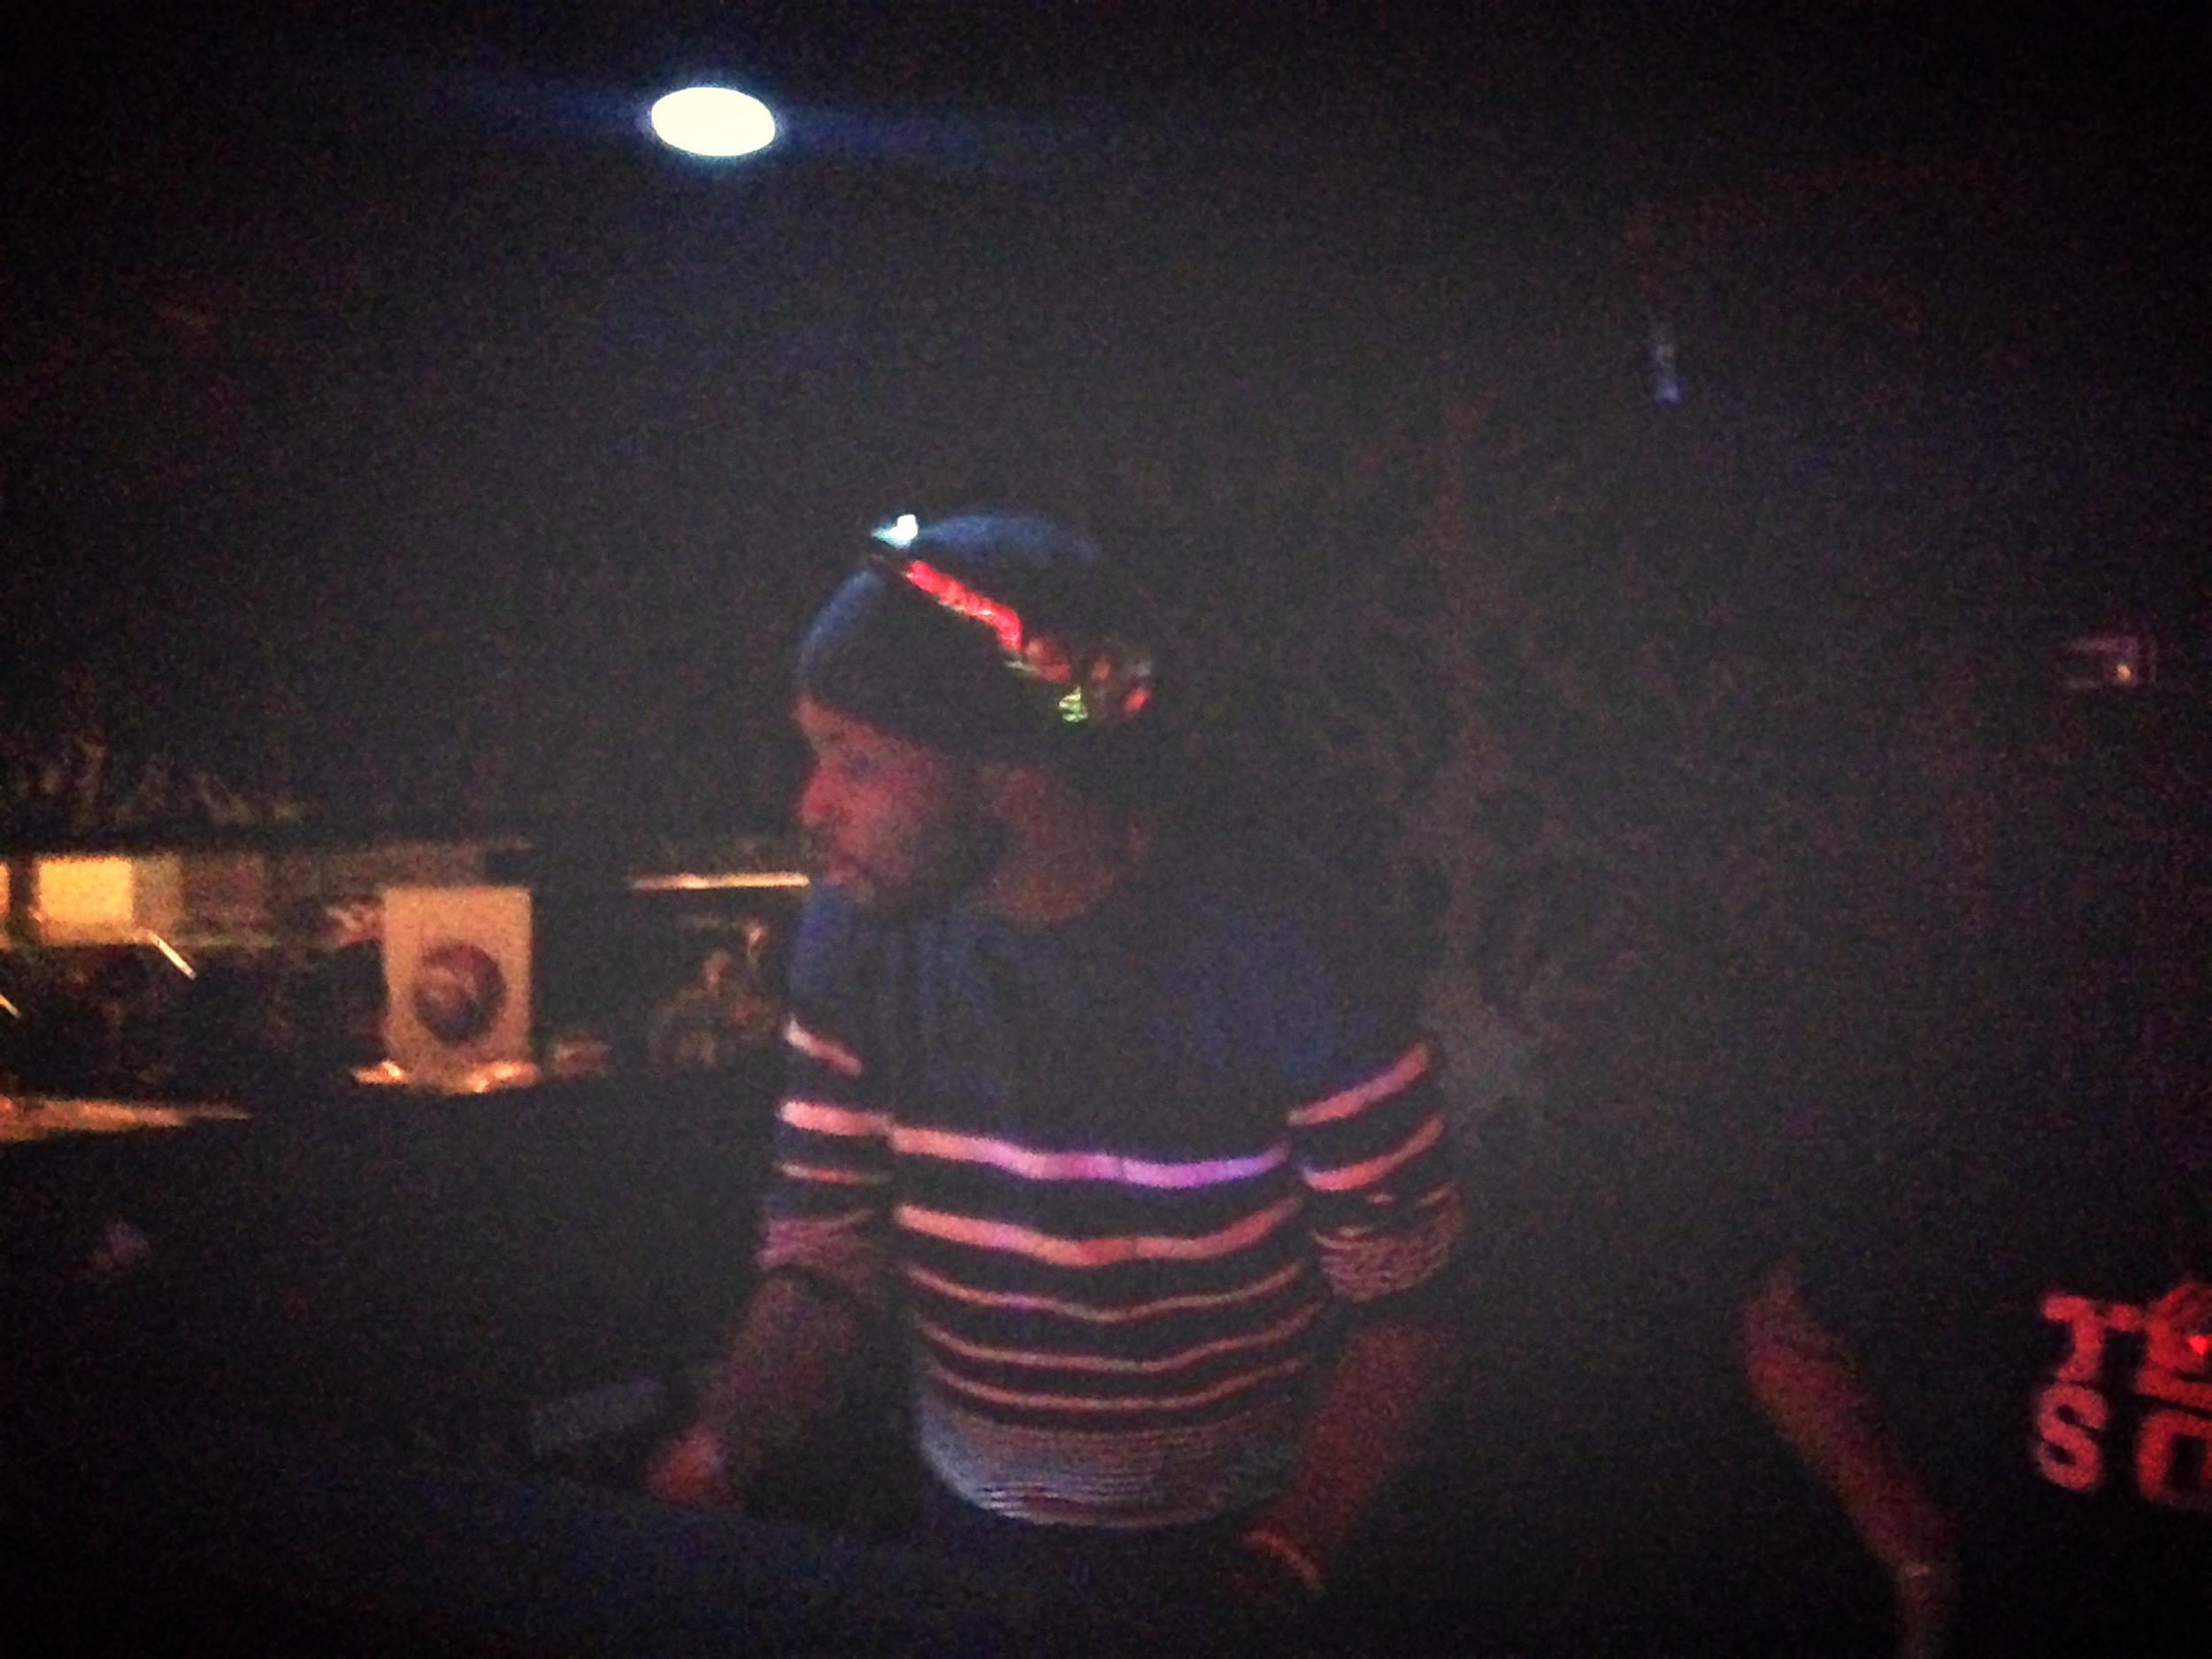 DJ Bimshire at Tremors